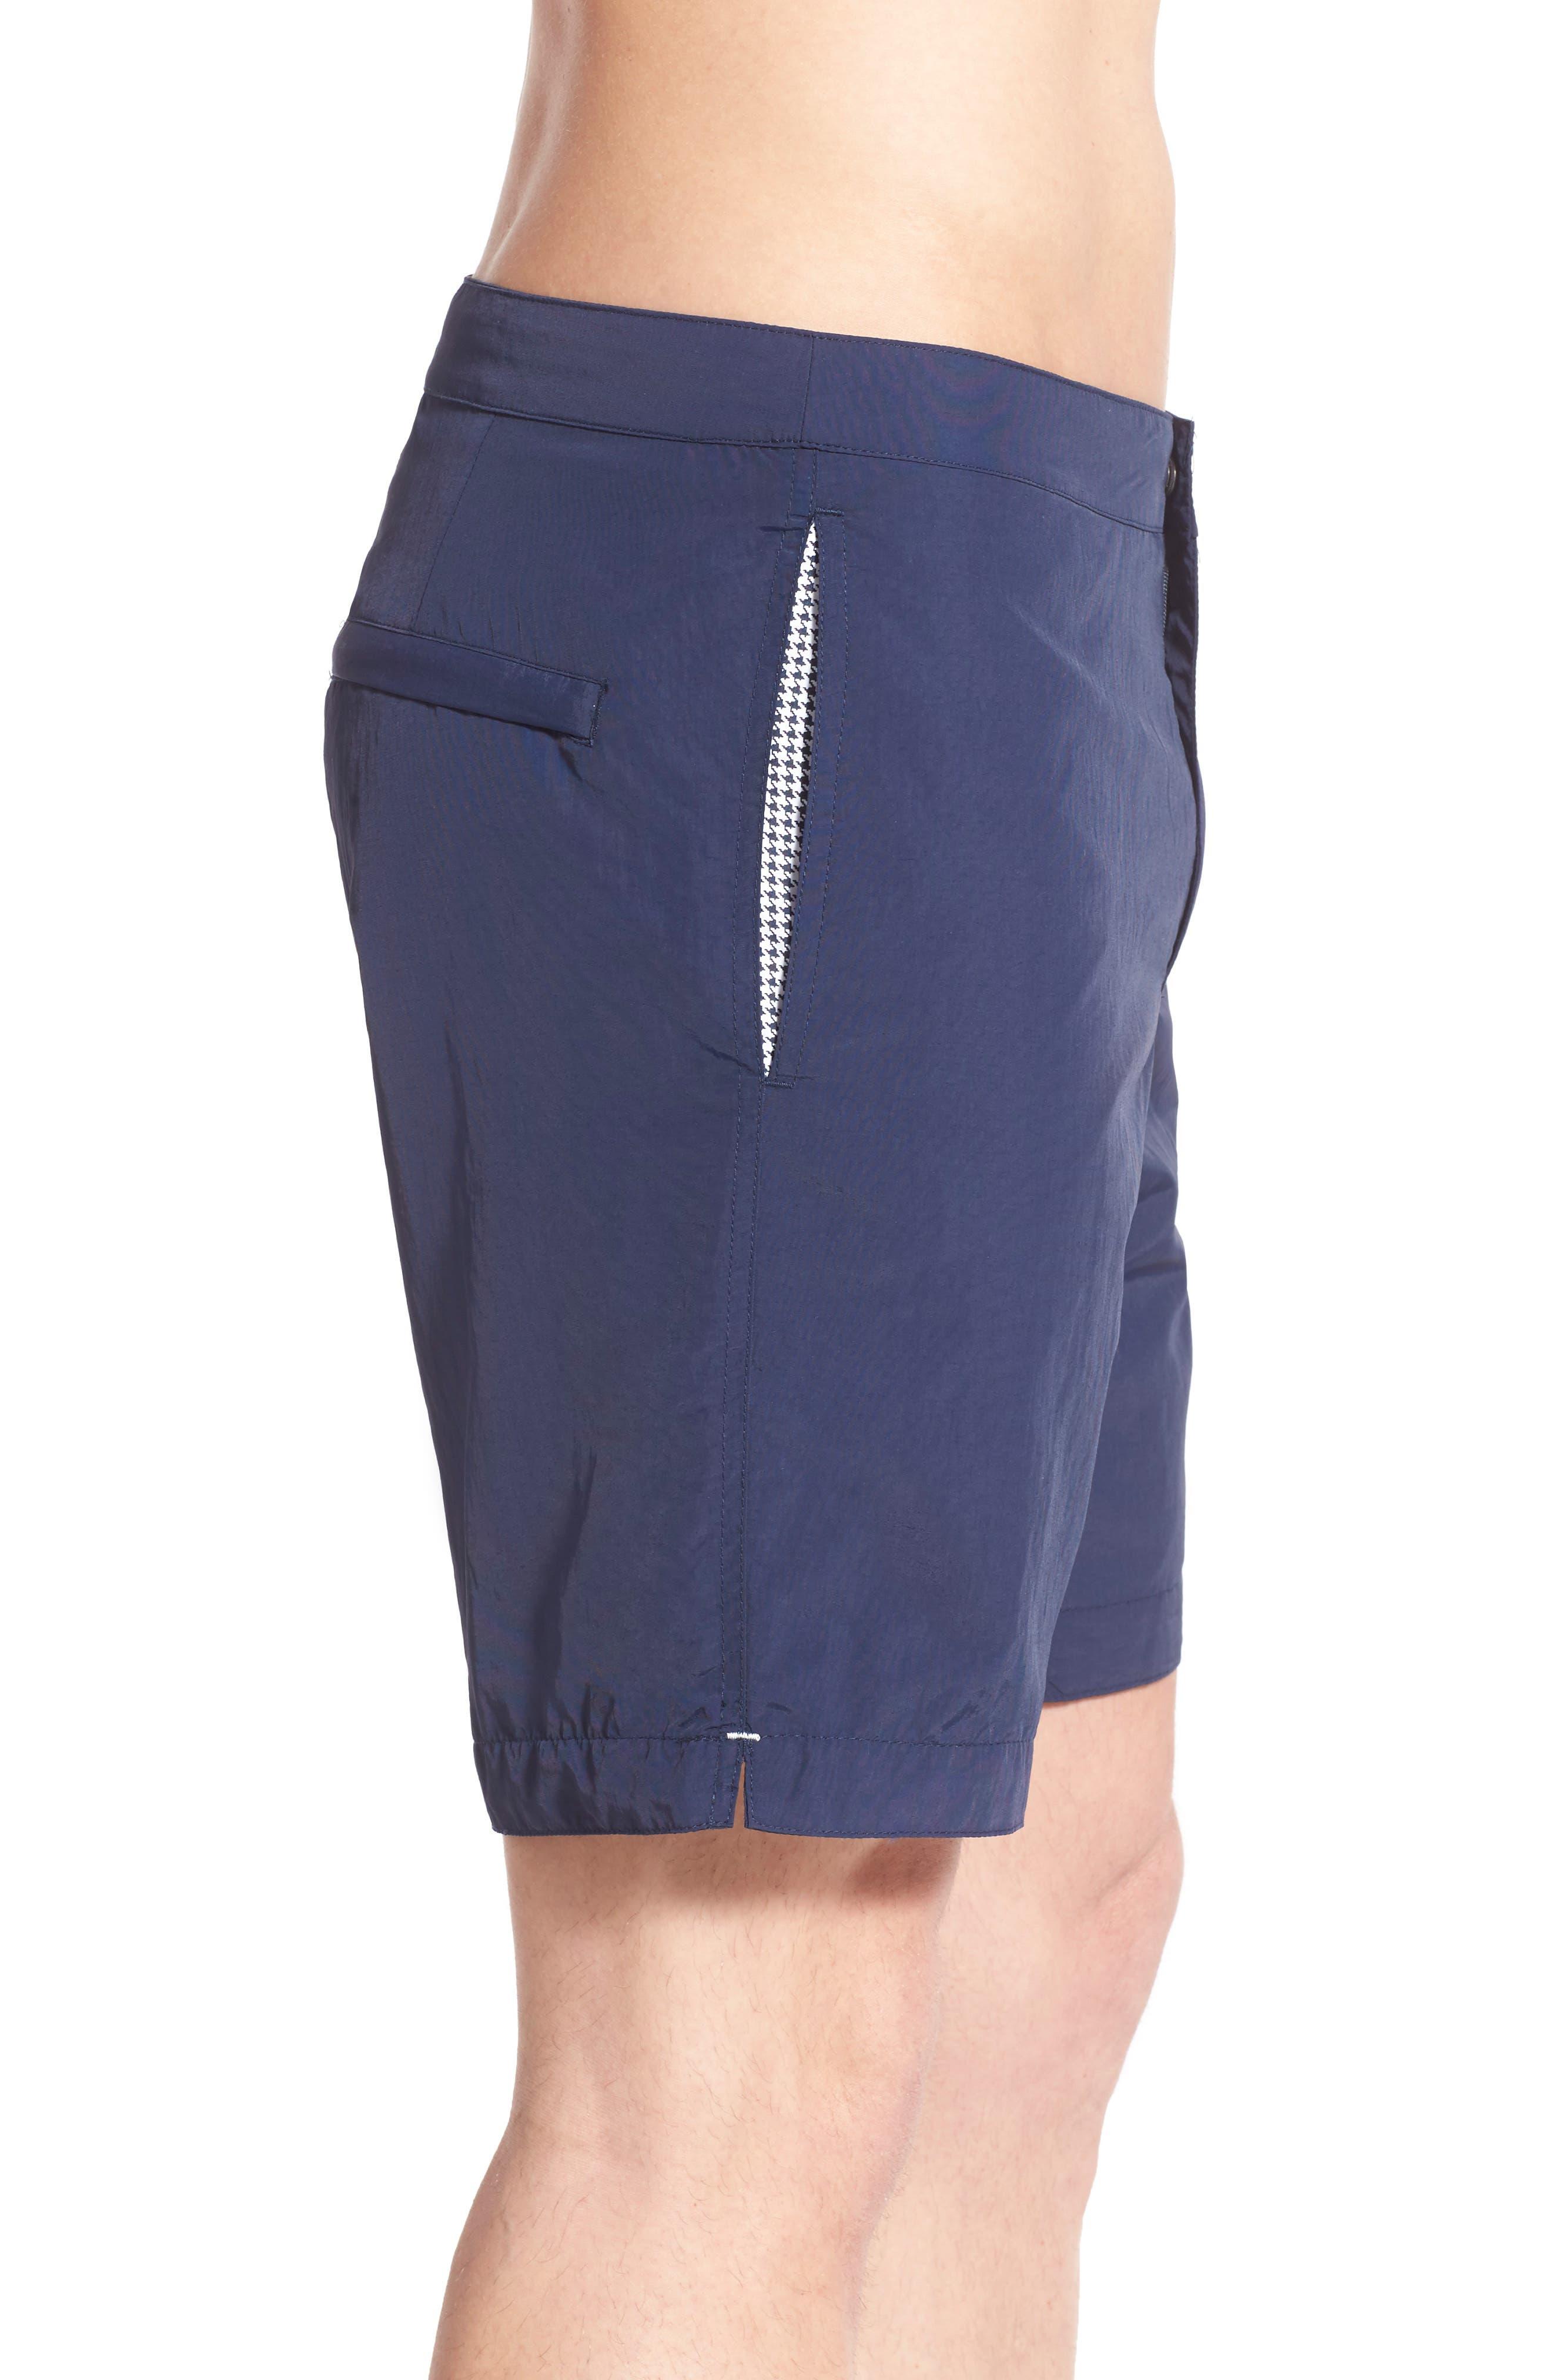 Aruba Tailored Fit 8.5 Inch Swim Trunks,                             Alternate thumbnail 4, color,                             415